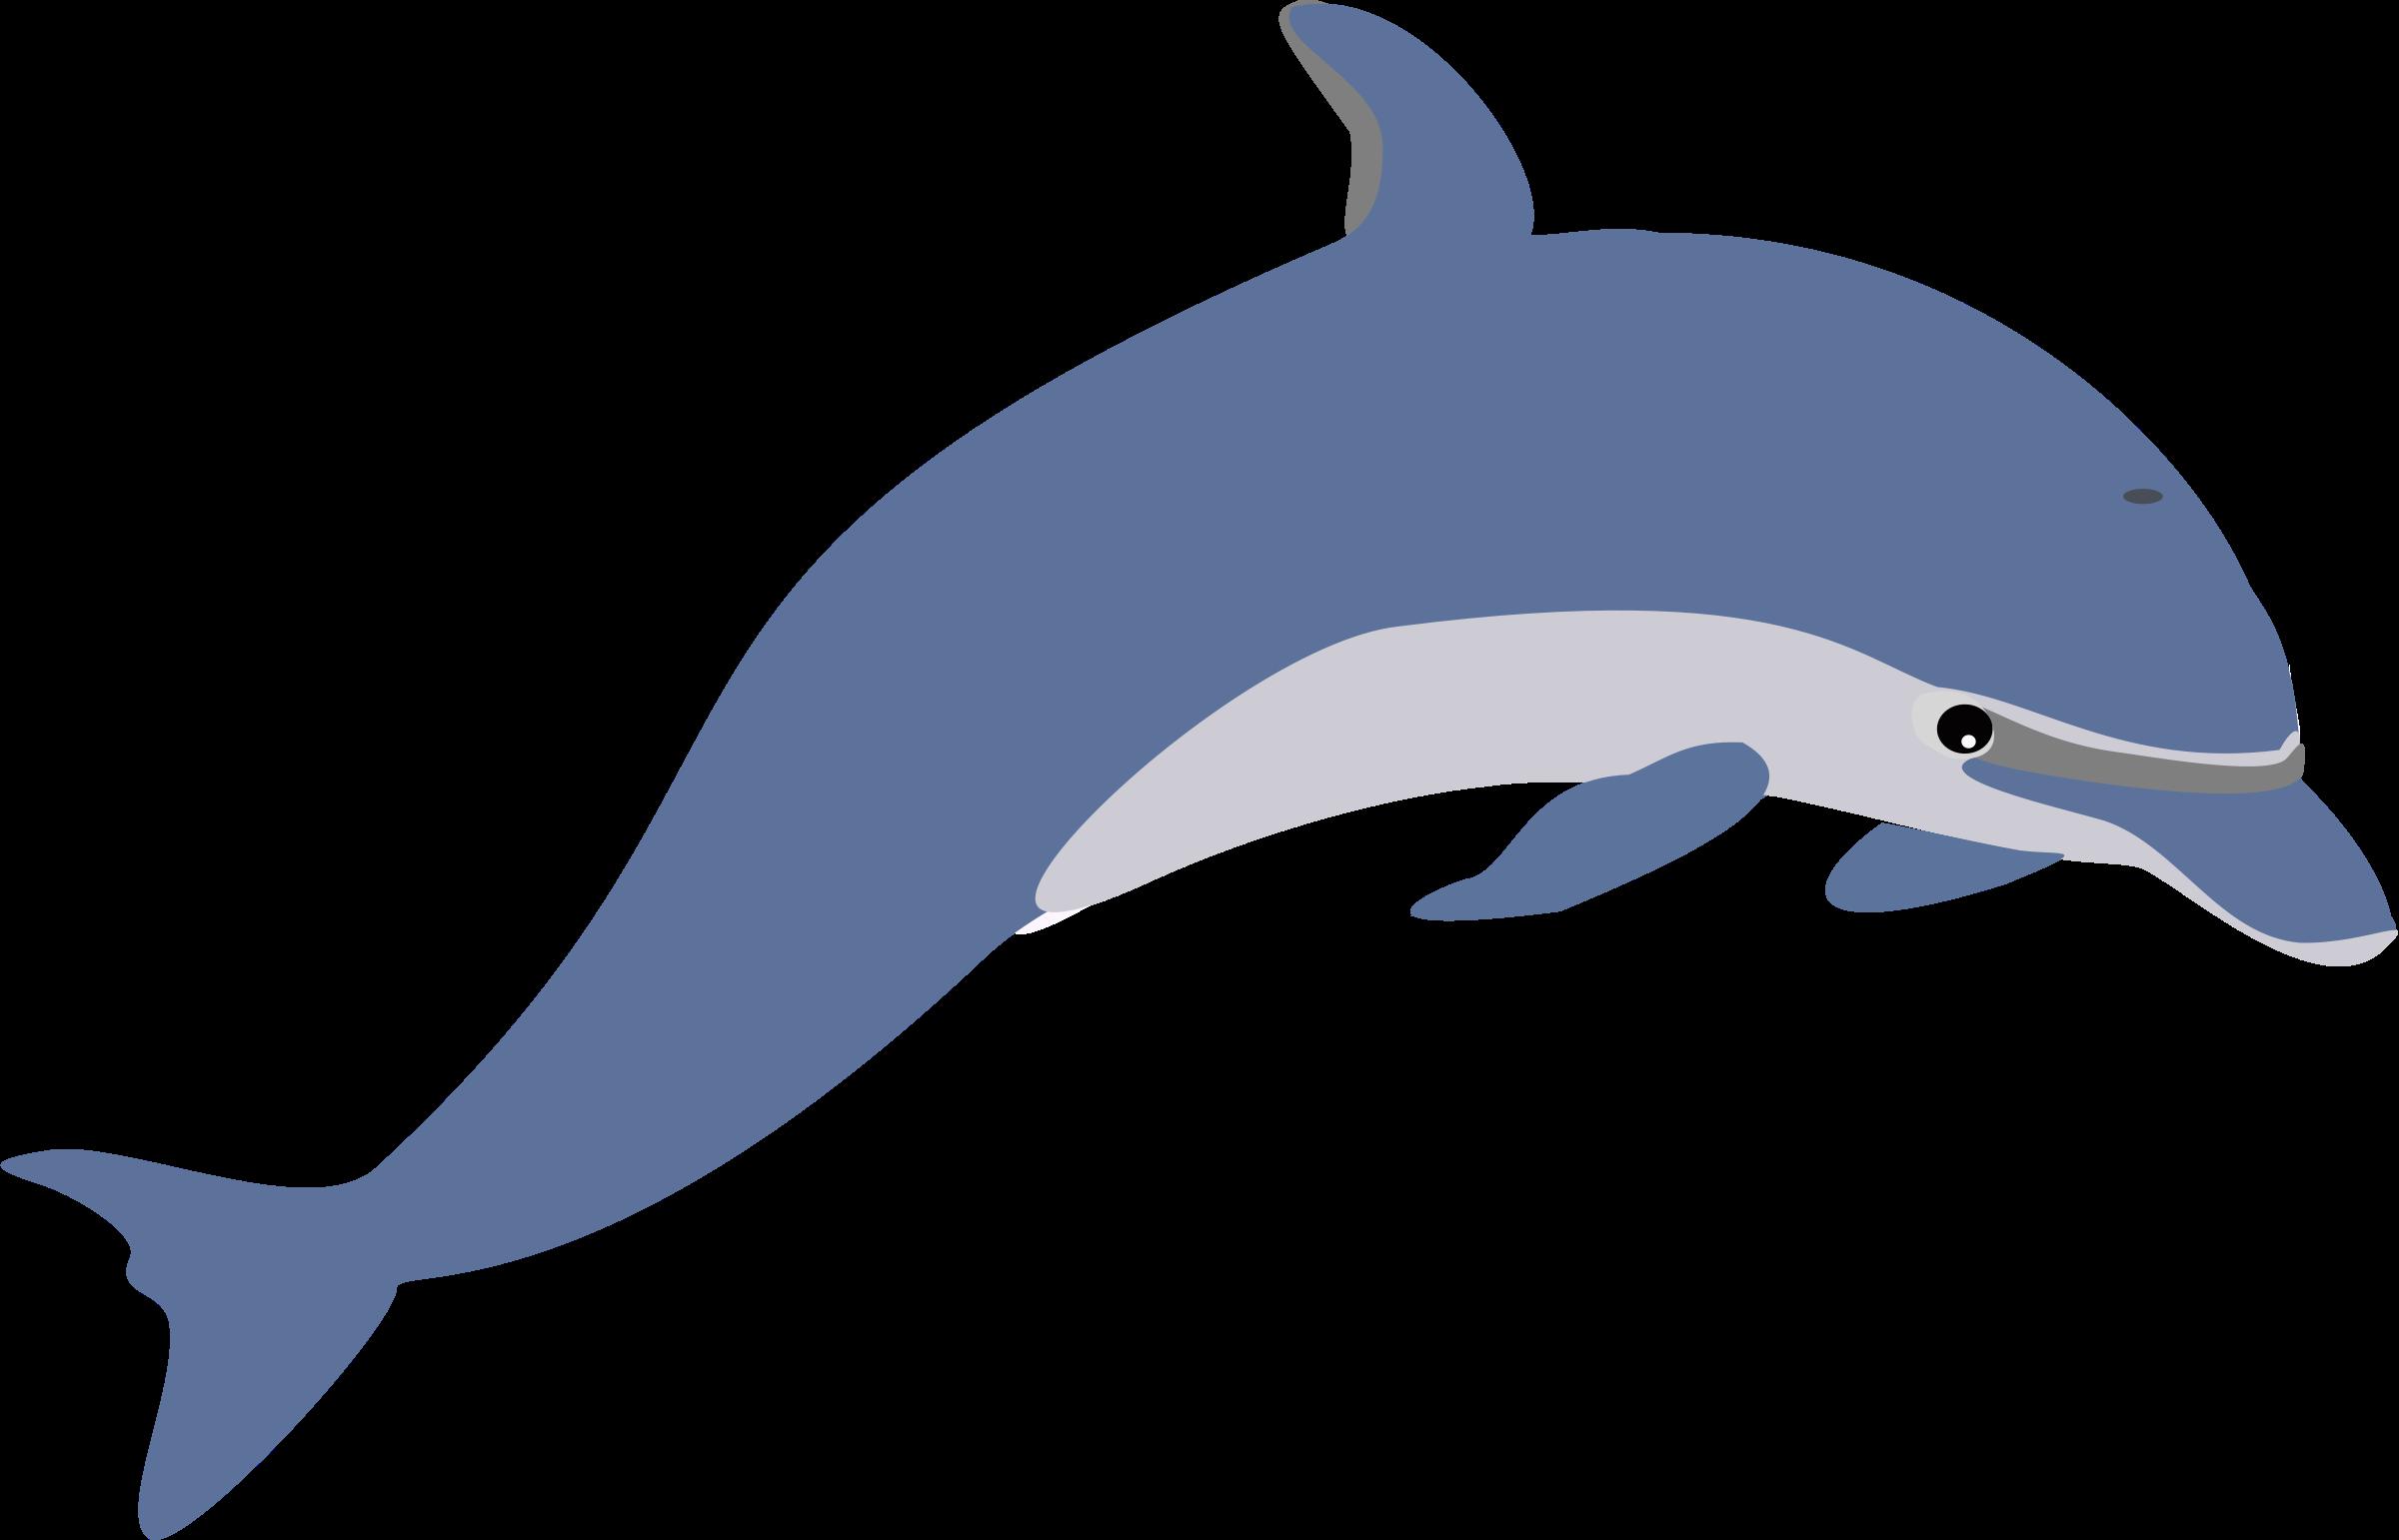 Dolphin clipart. Clip art free panda